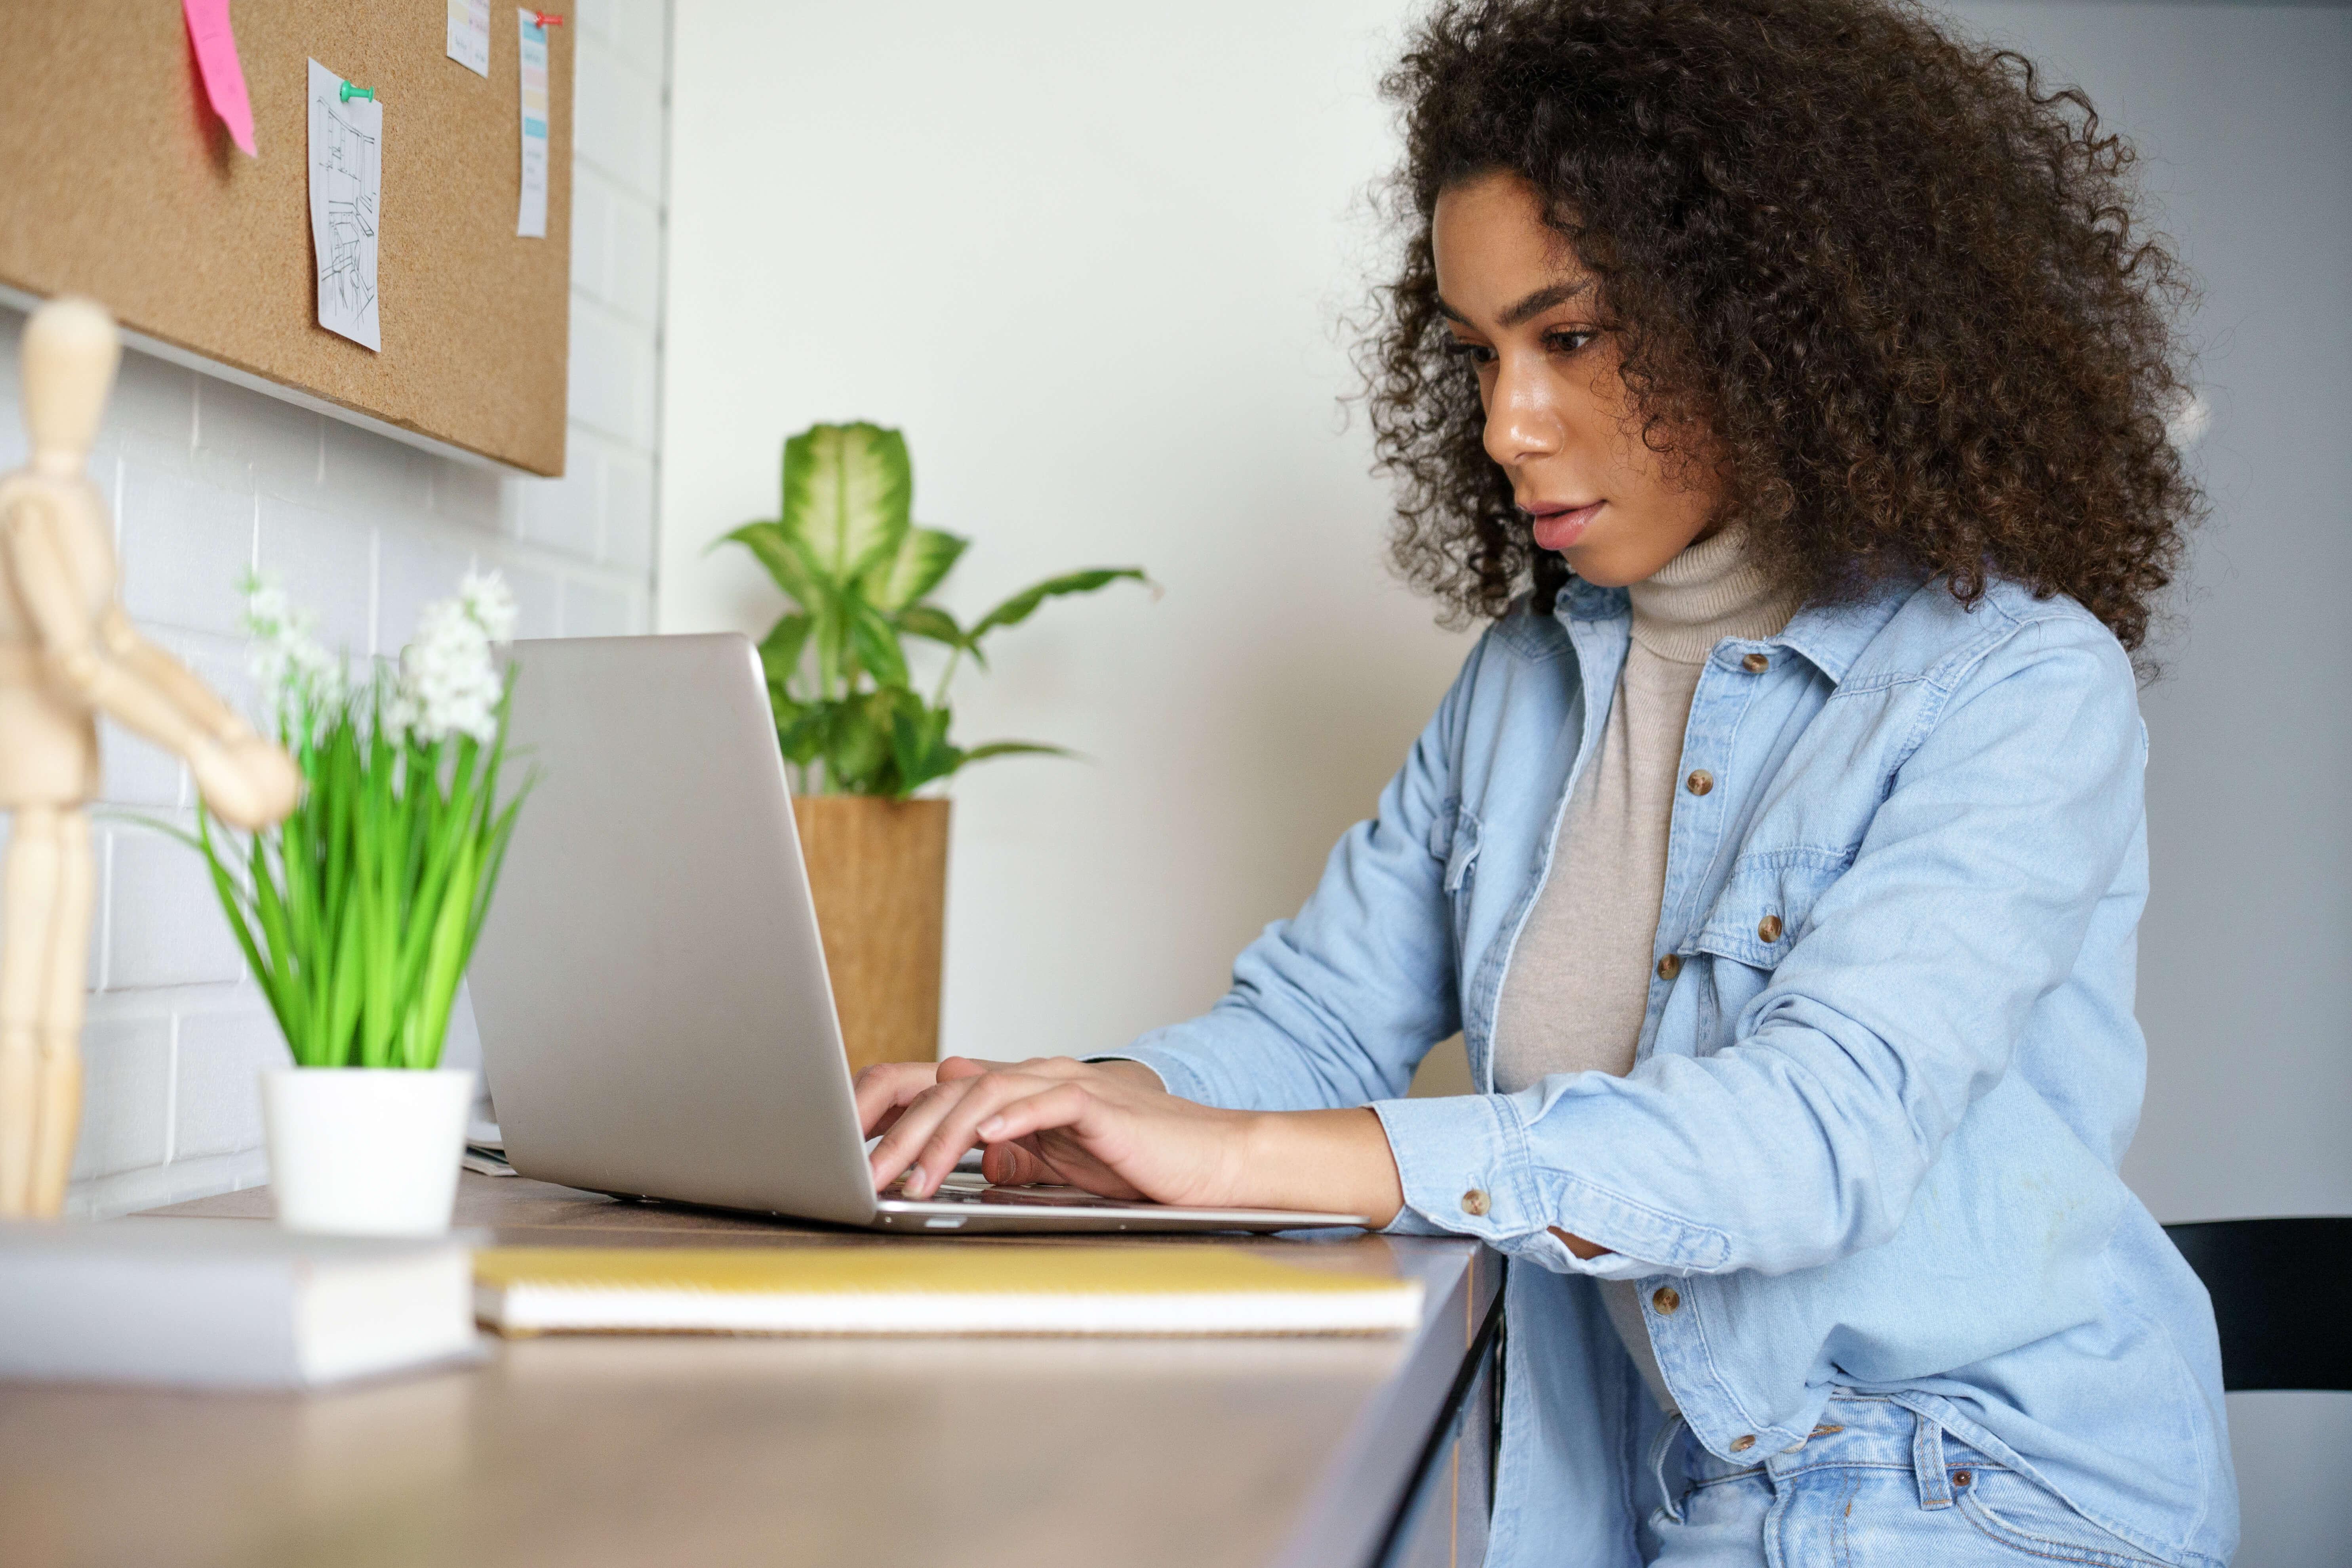 University of Bradford: Online MBA, instant impact